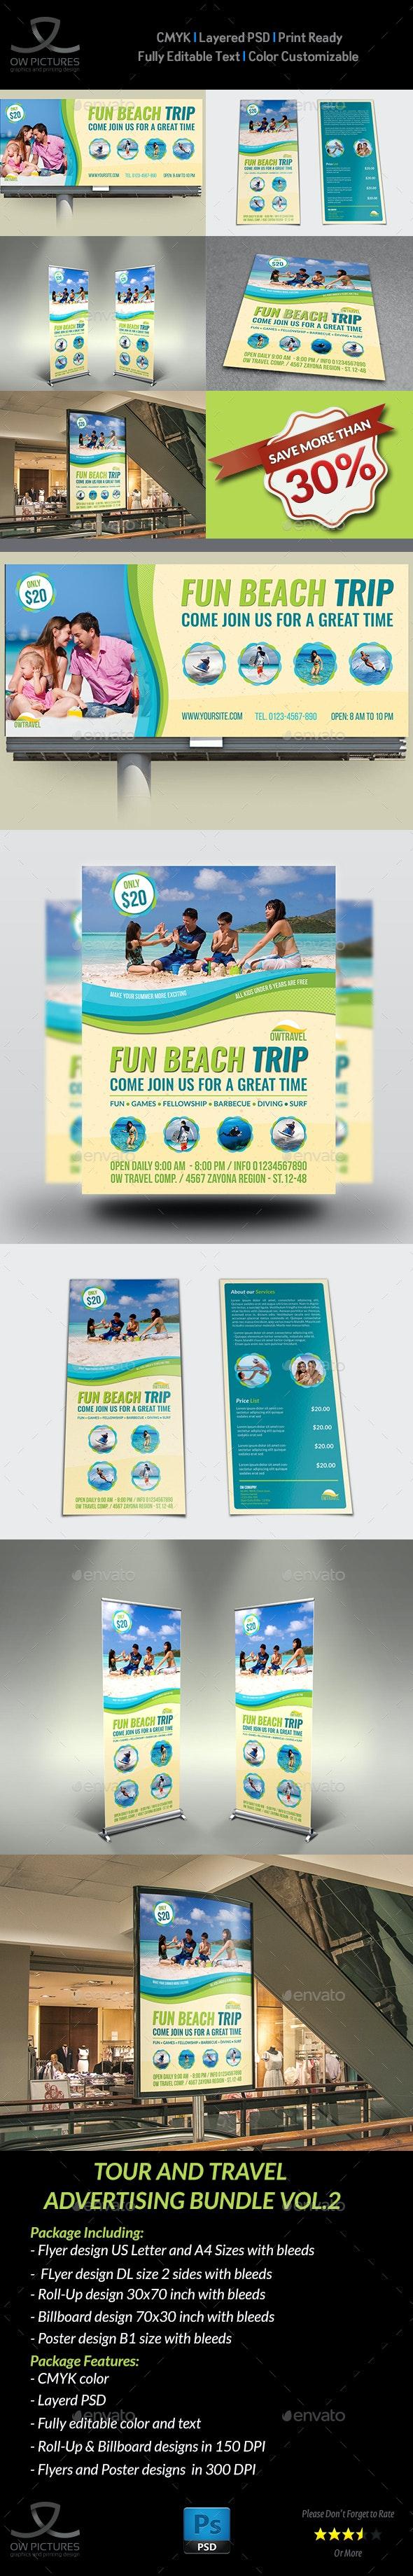 Tour and Travel Advertising Bundle Vol.2 - Signage Print Templates